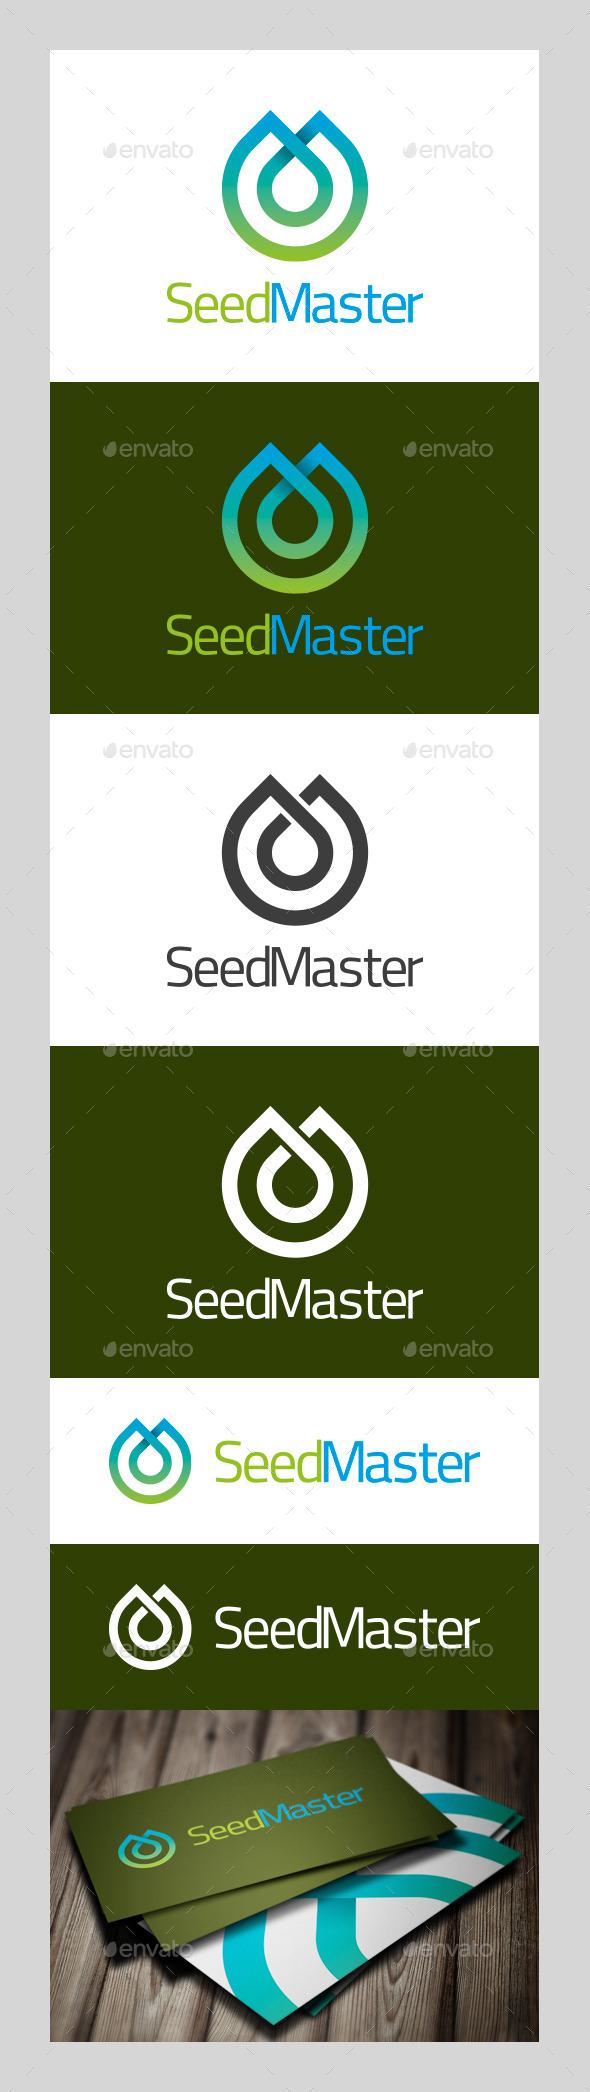 GraphicRiver SeedMaster Logo 9579171